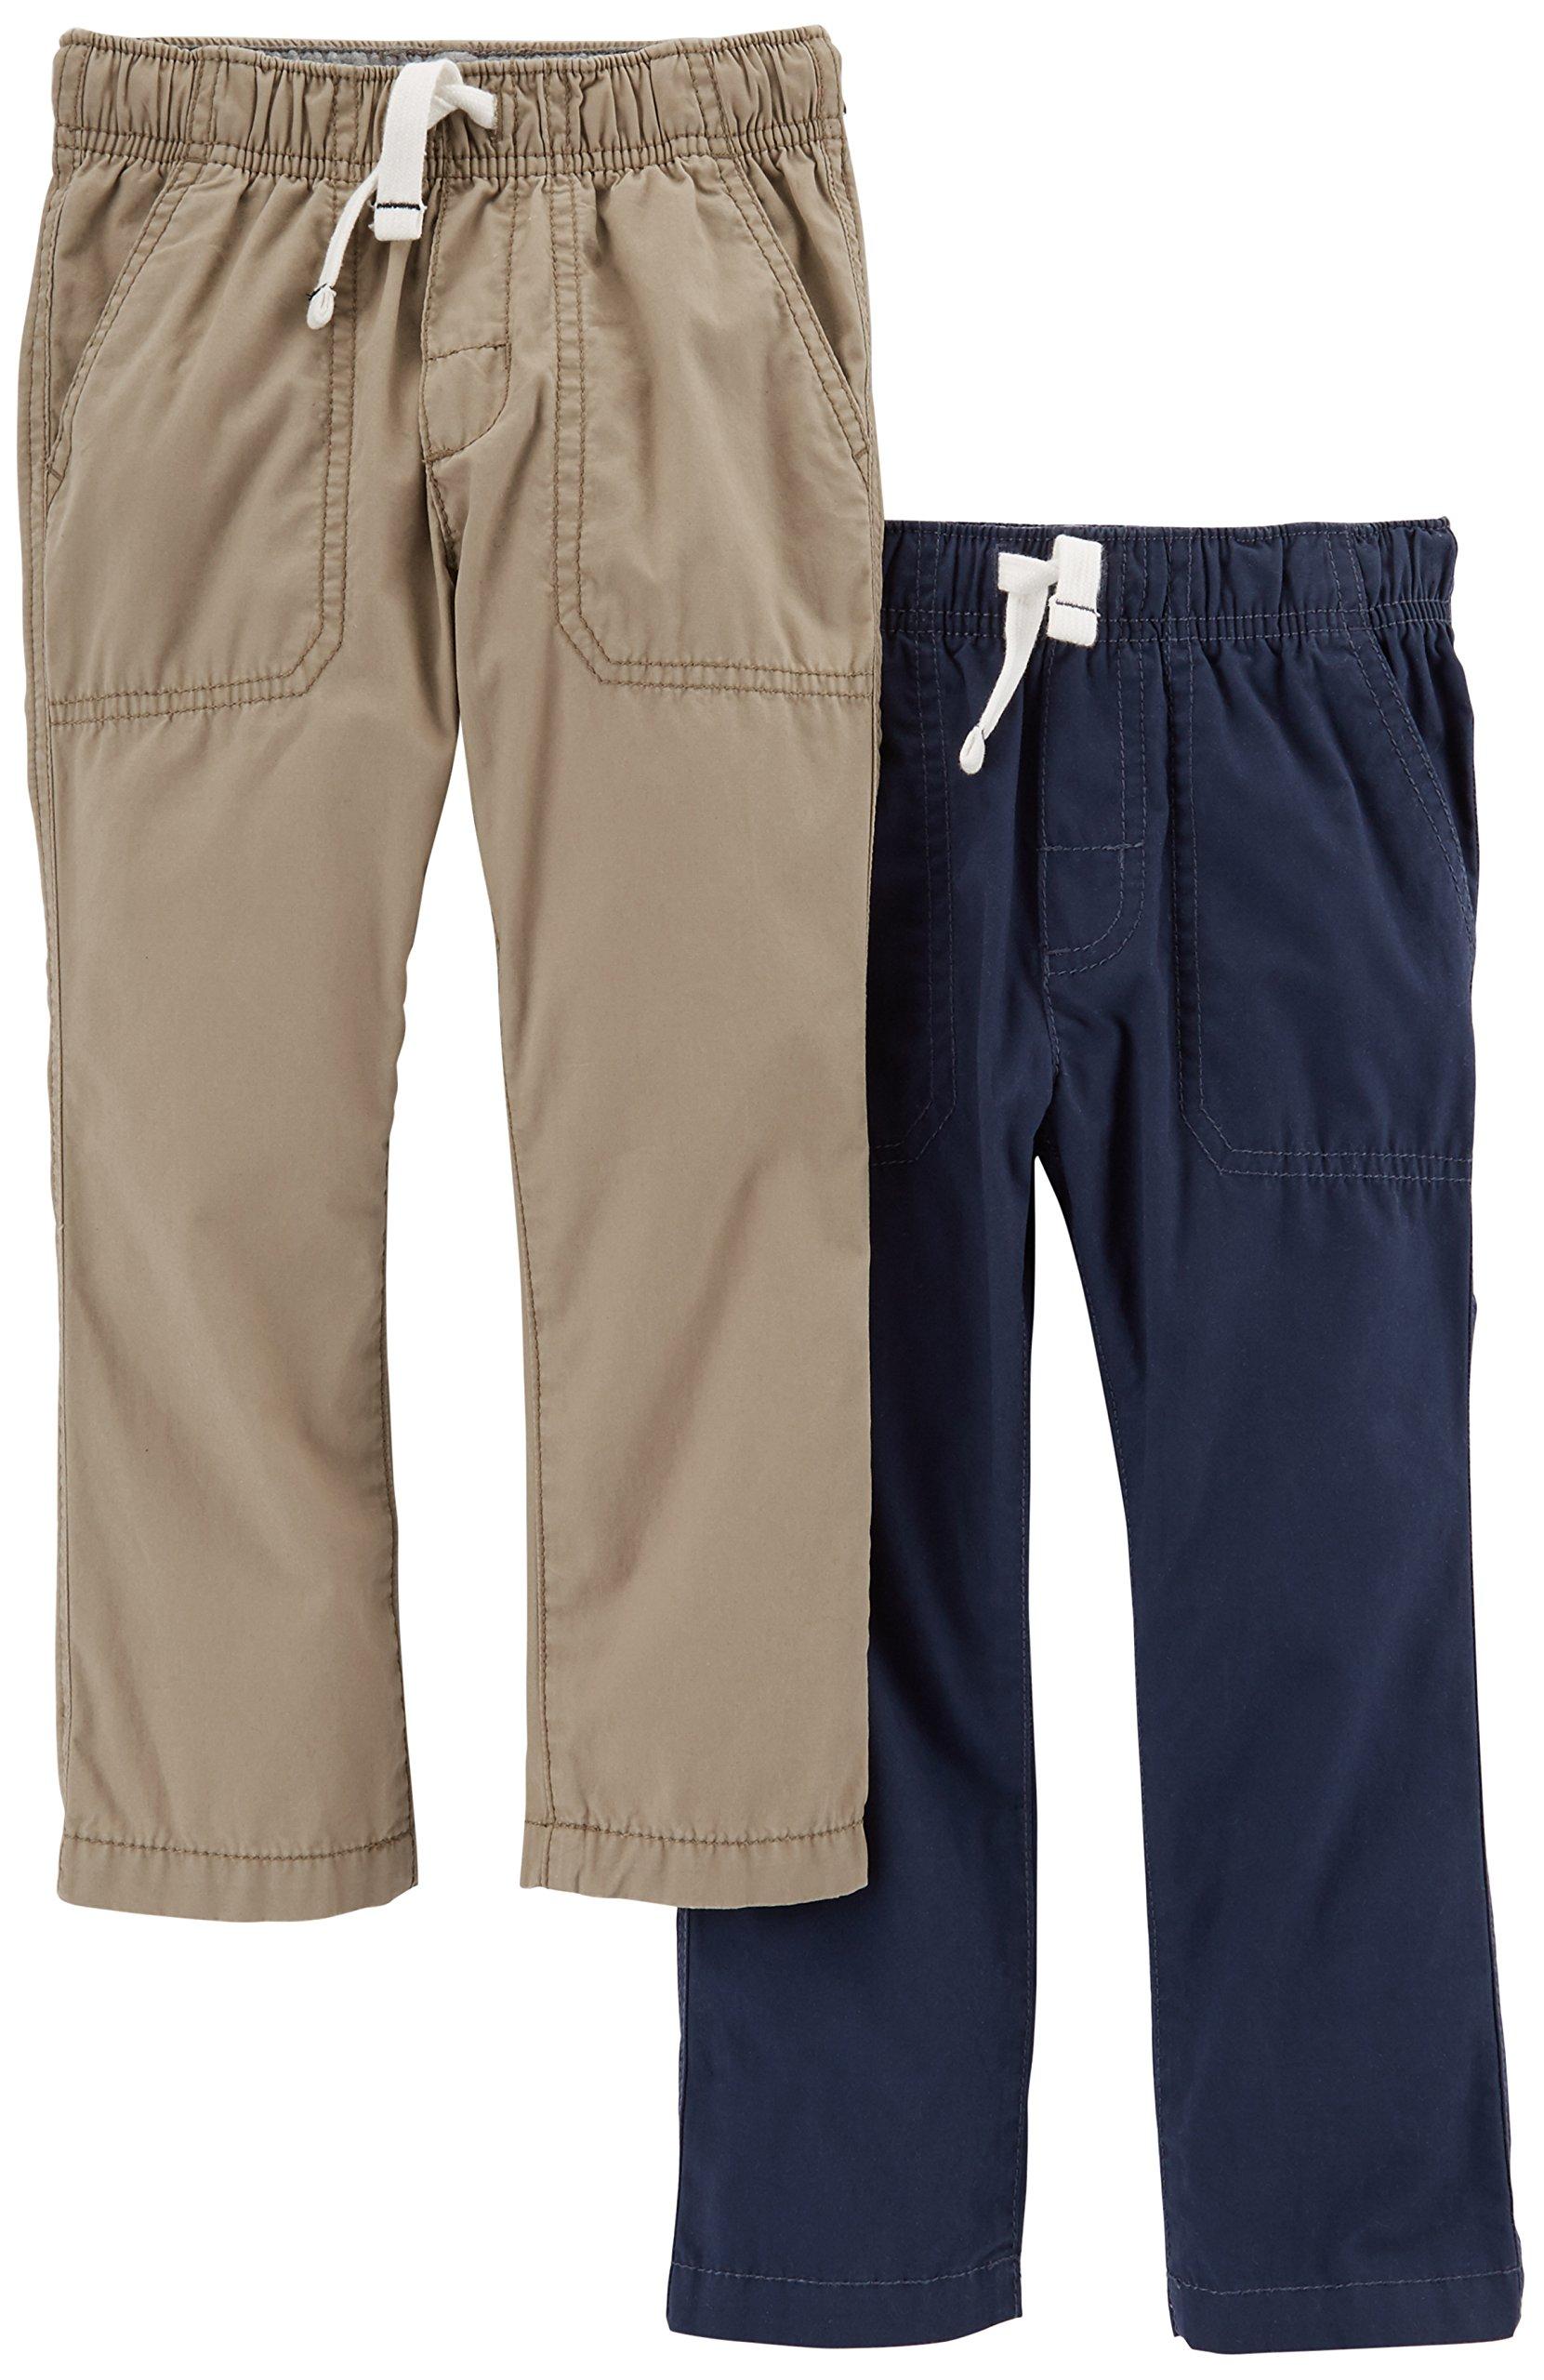 Carter's Big Boys' 2-Pack Woven Pant, Khaki/Navy, 5